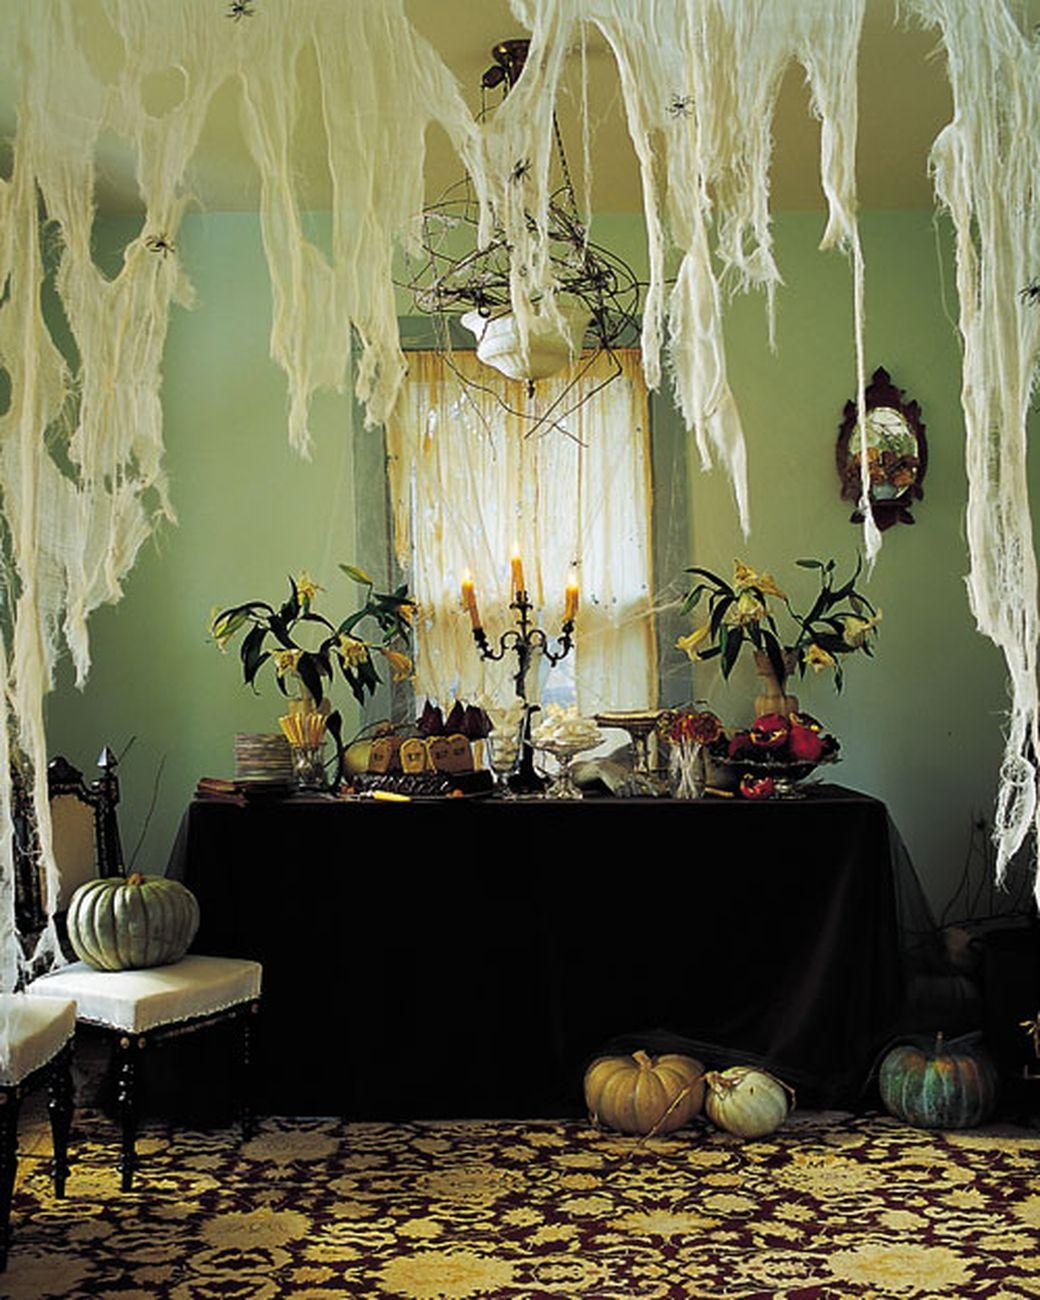 02b1e0d0b2c28181f06f7a80d41fa7f7jpg - Halloween Ceiling Decorations